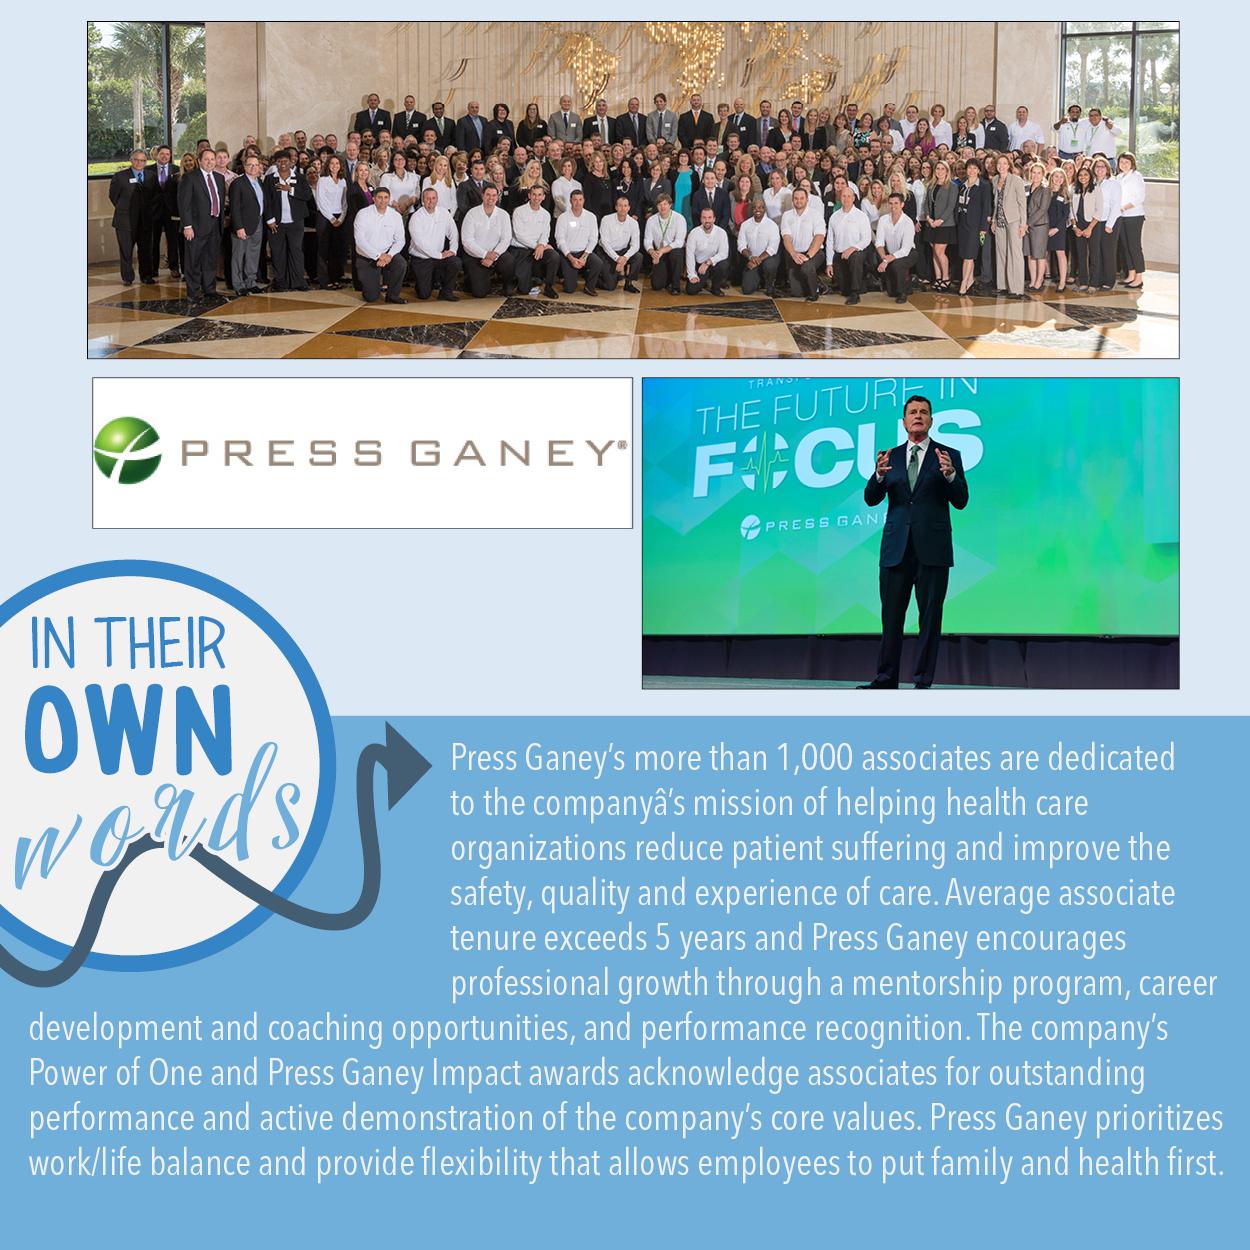 pressganey-gptw